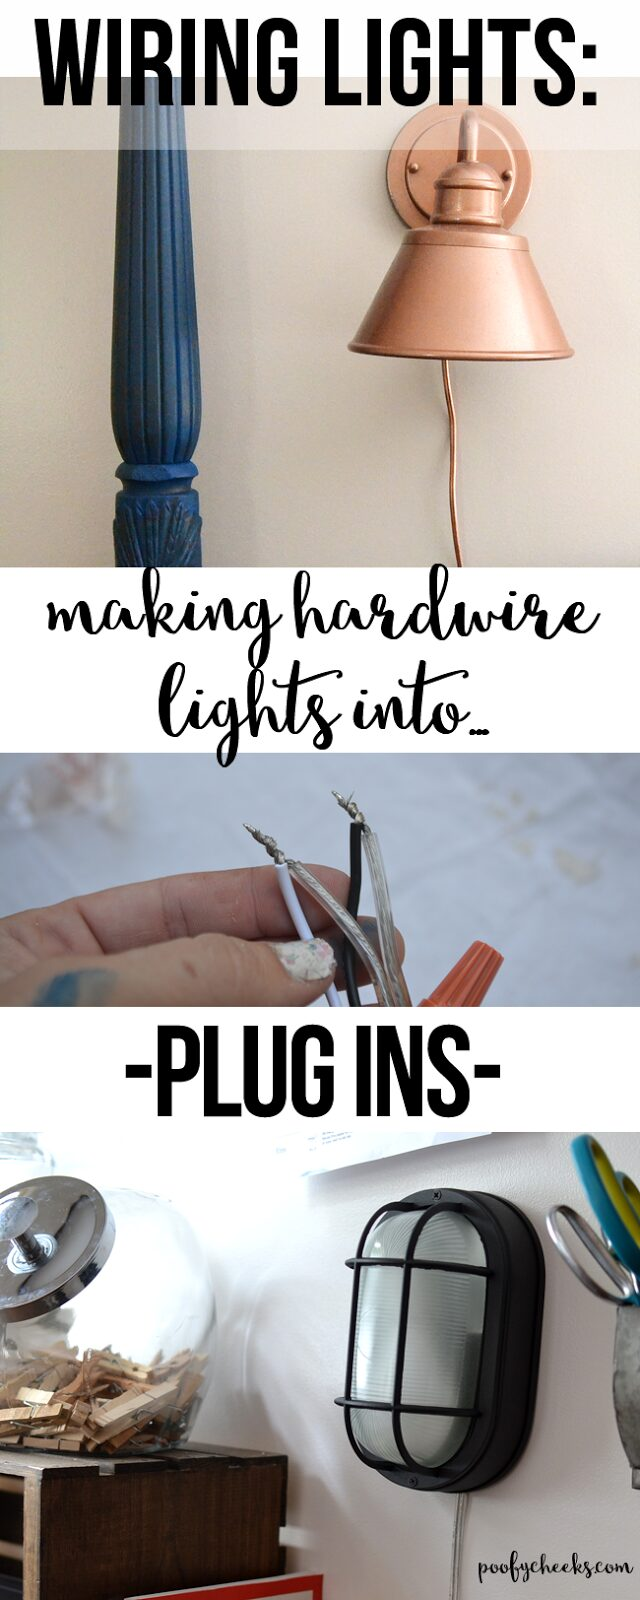 Turn Hardwired Lights into Plug In Lights